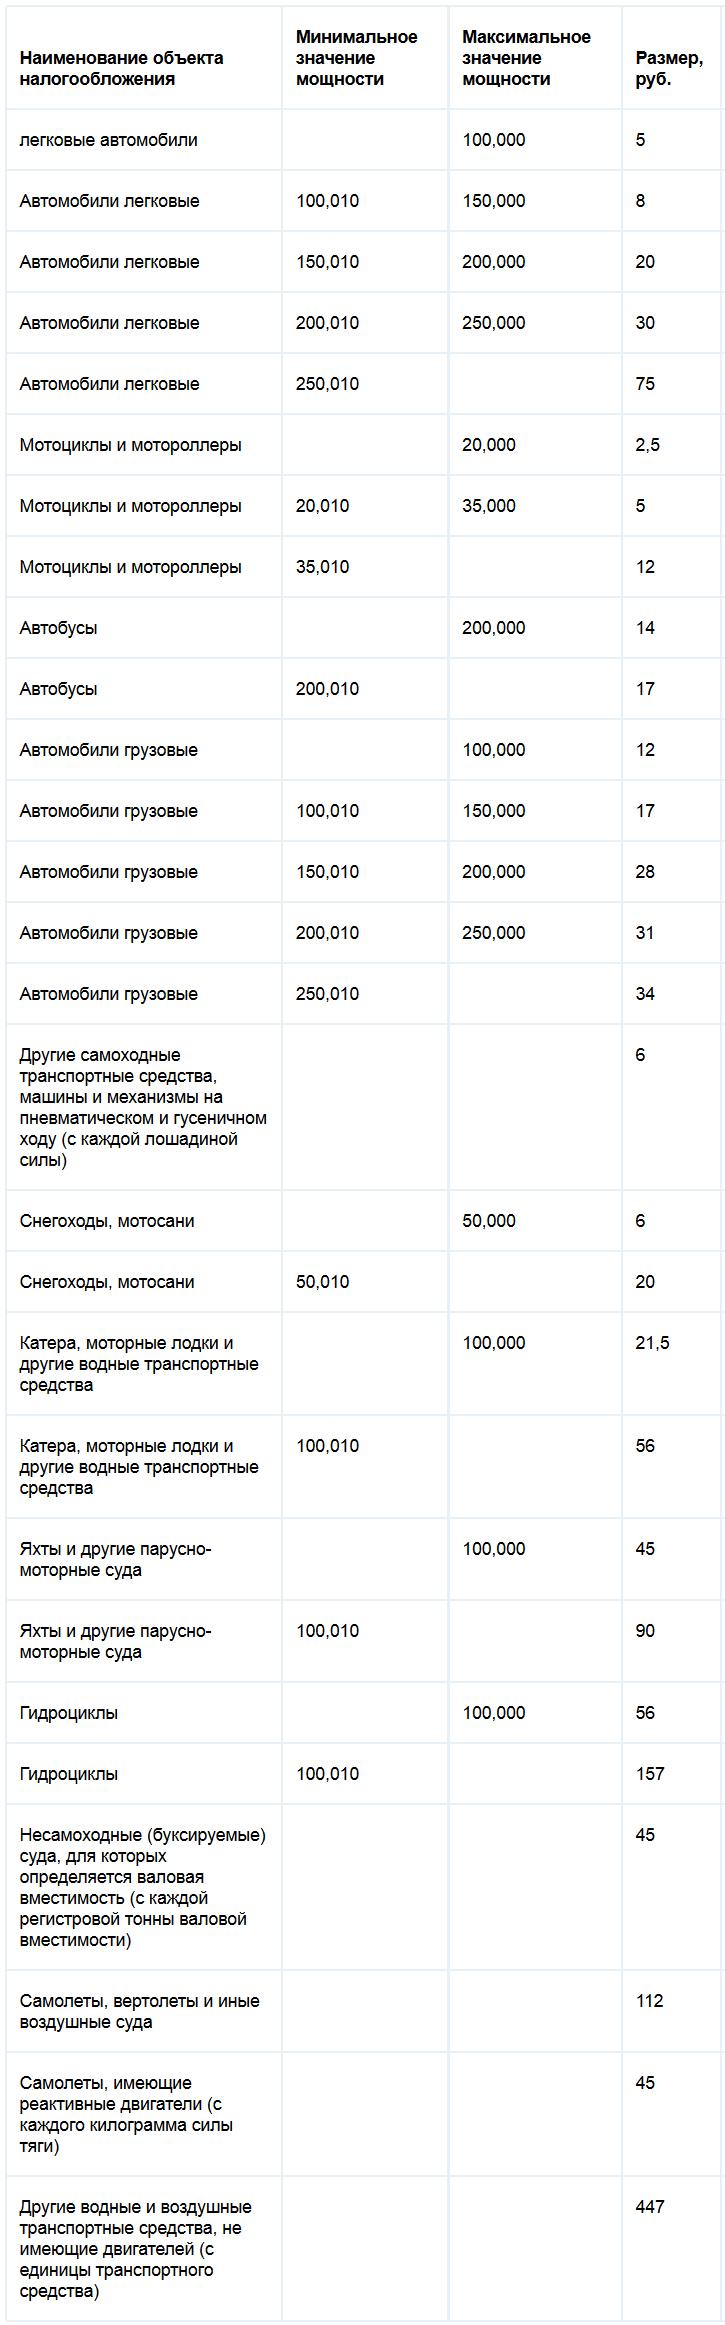 Ставки транспортного налога Томской области